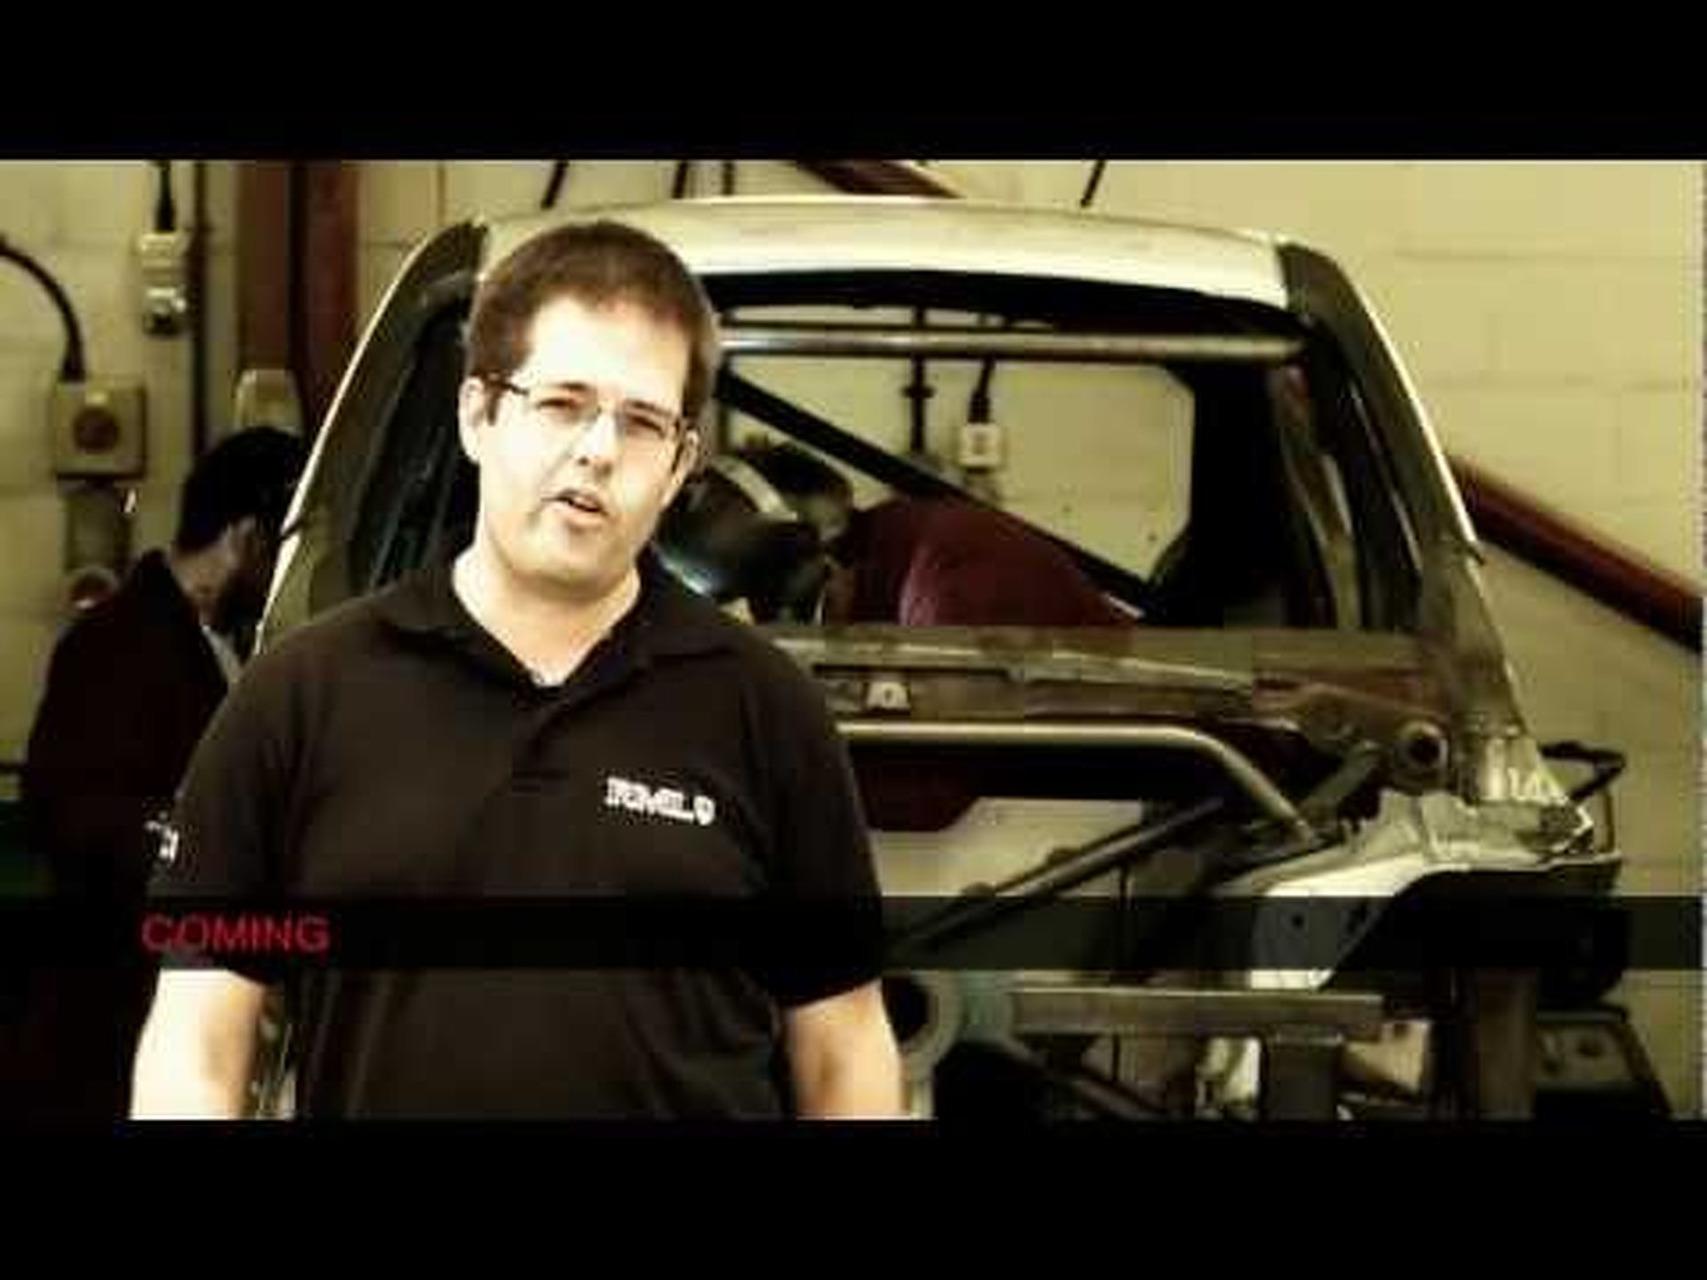 2011 Nissan Juke-R Concept - Seat Fitting and Ergonomics